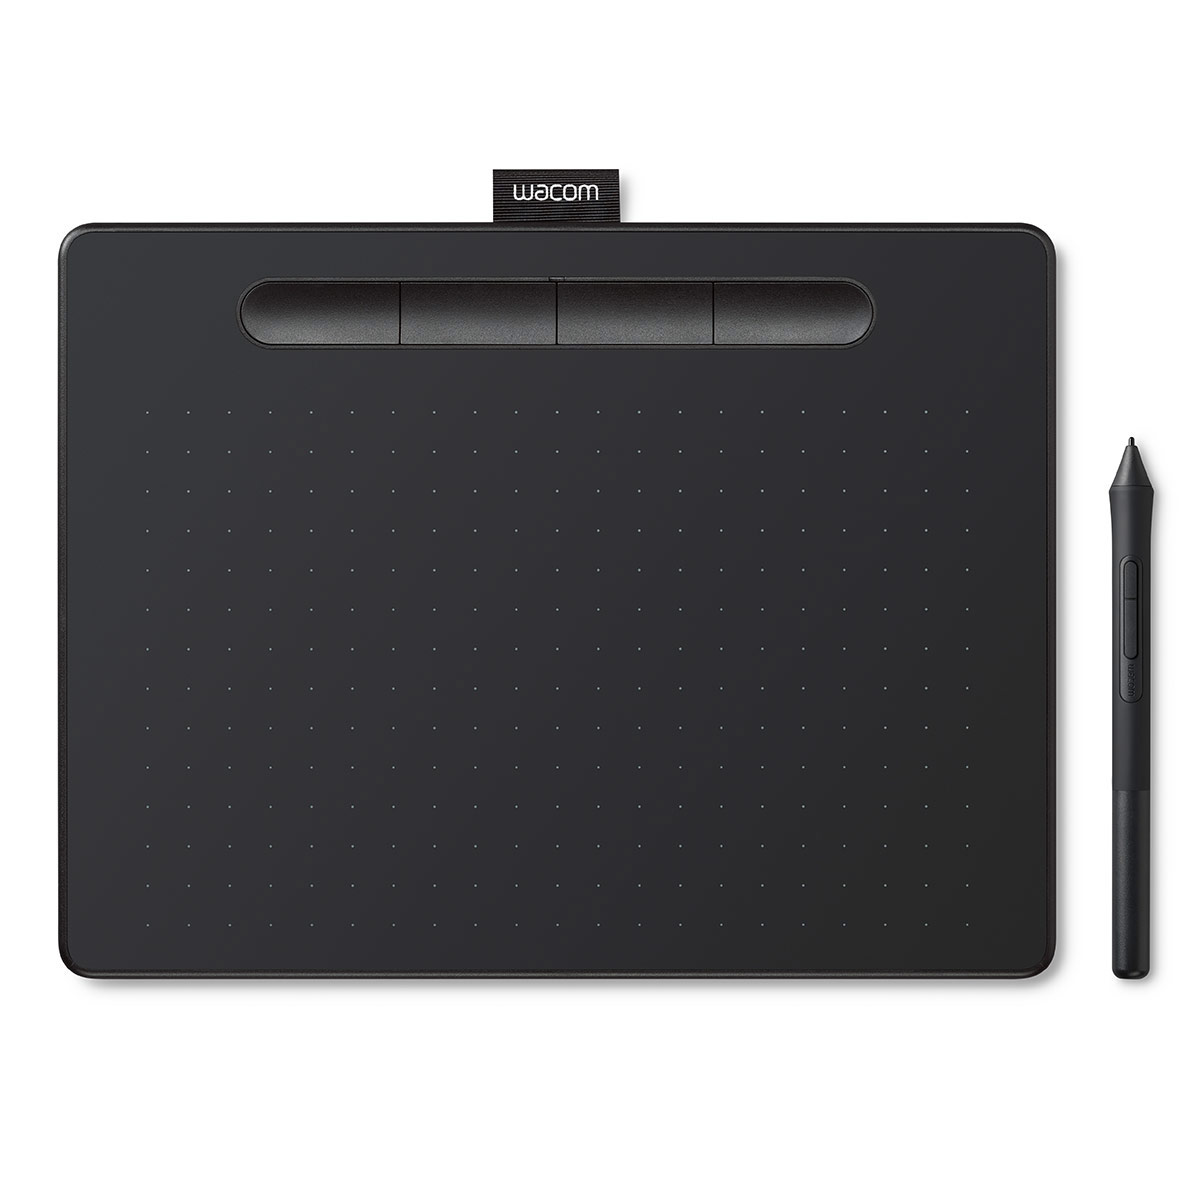 Wacom Intuos Medium (M) - With Bluetooth - Black